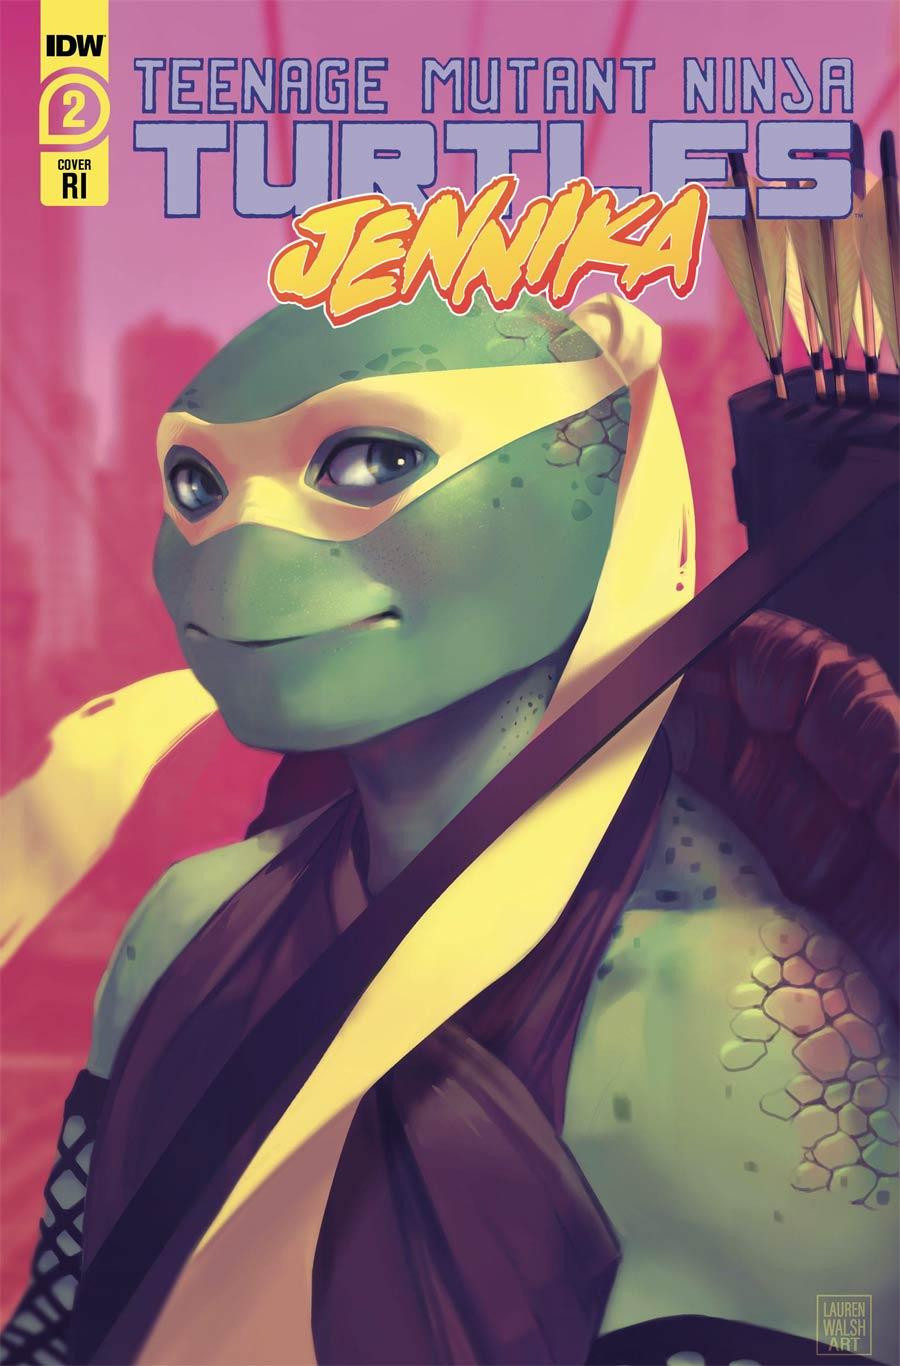 Teenage Mutant Ninja Turtles Jennika #2 Cover B Incentive Lauren Walsh Variant Cover